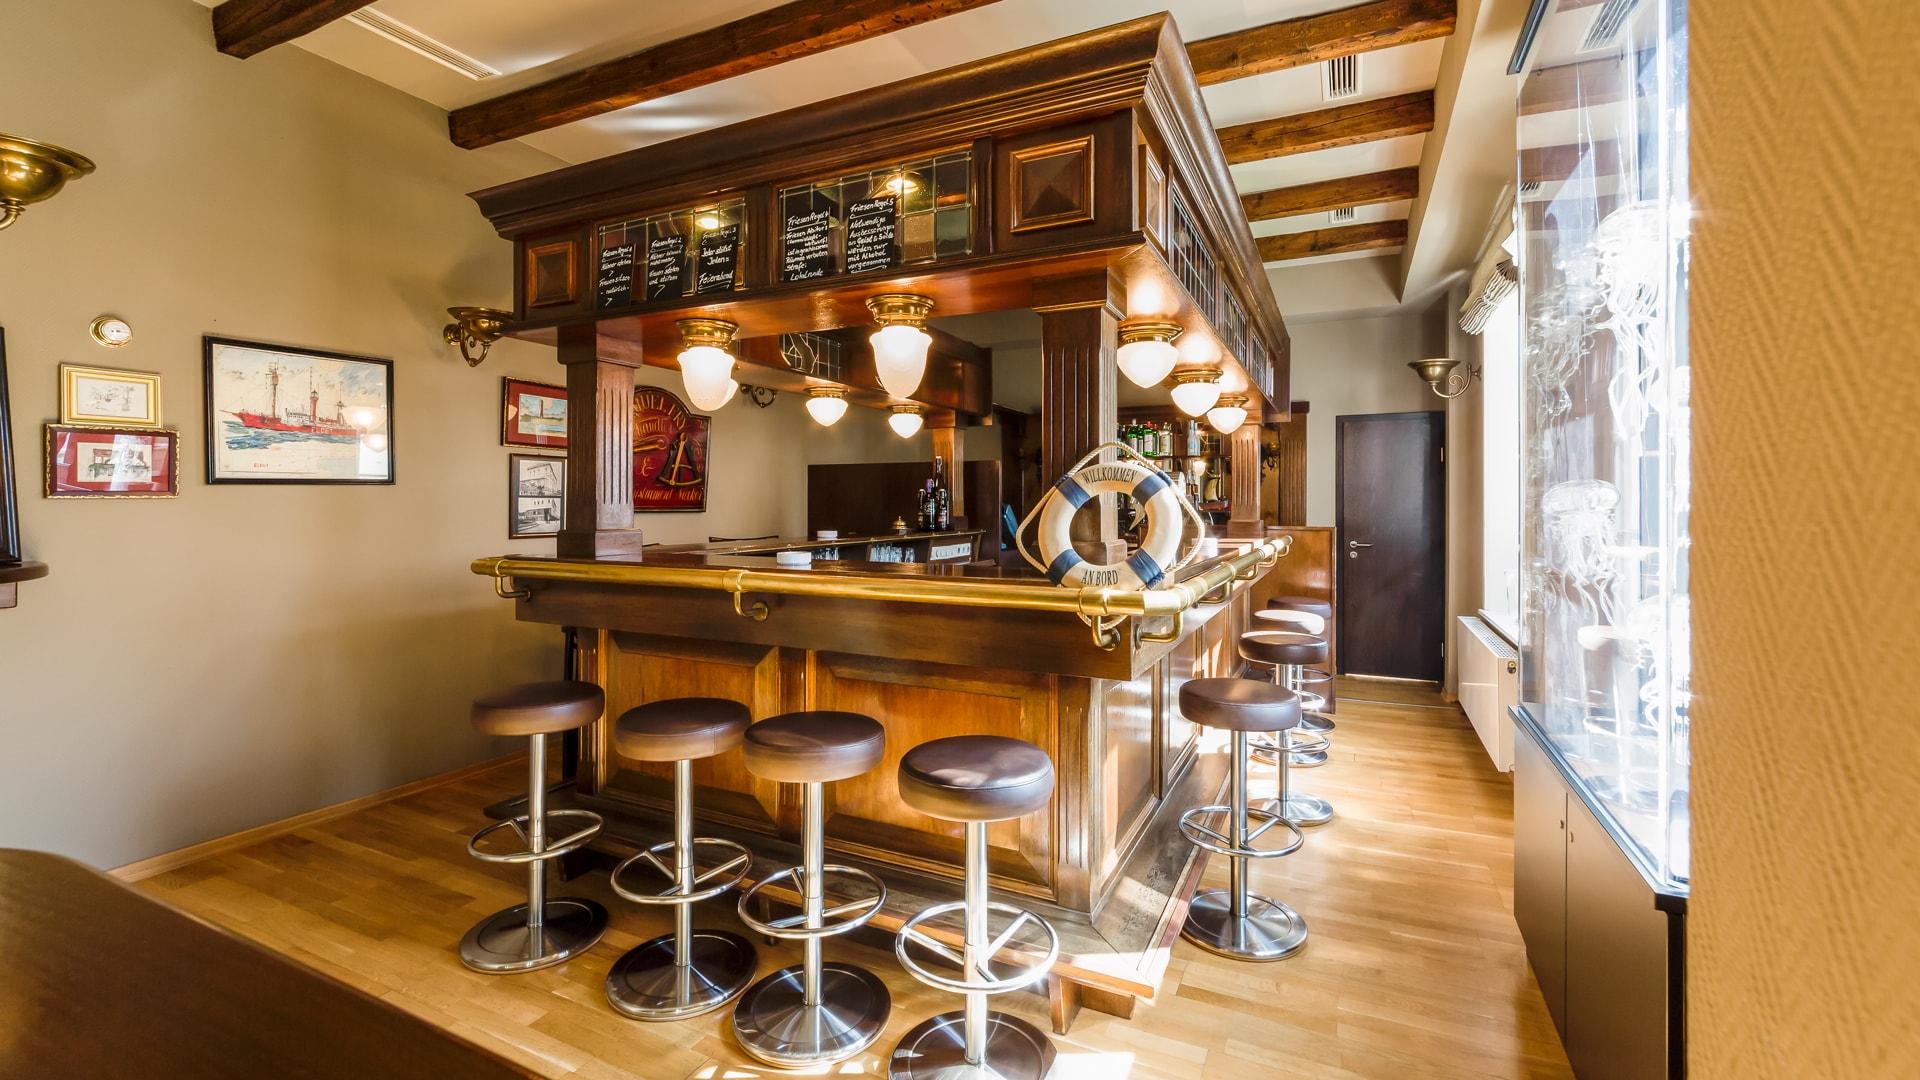 44 Michels_Hotels_Thalassohotel_Nordseehaus_Friesenpub_Qualle